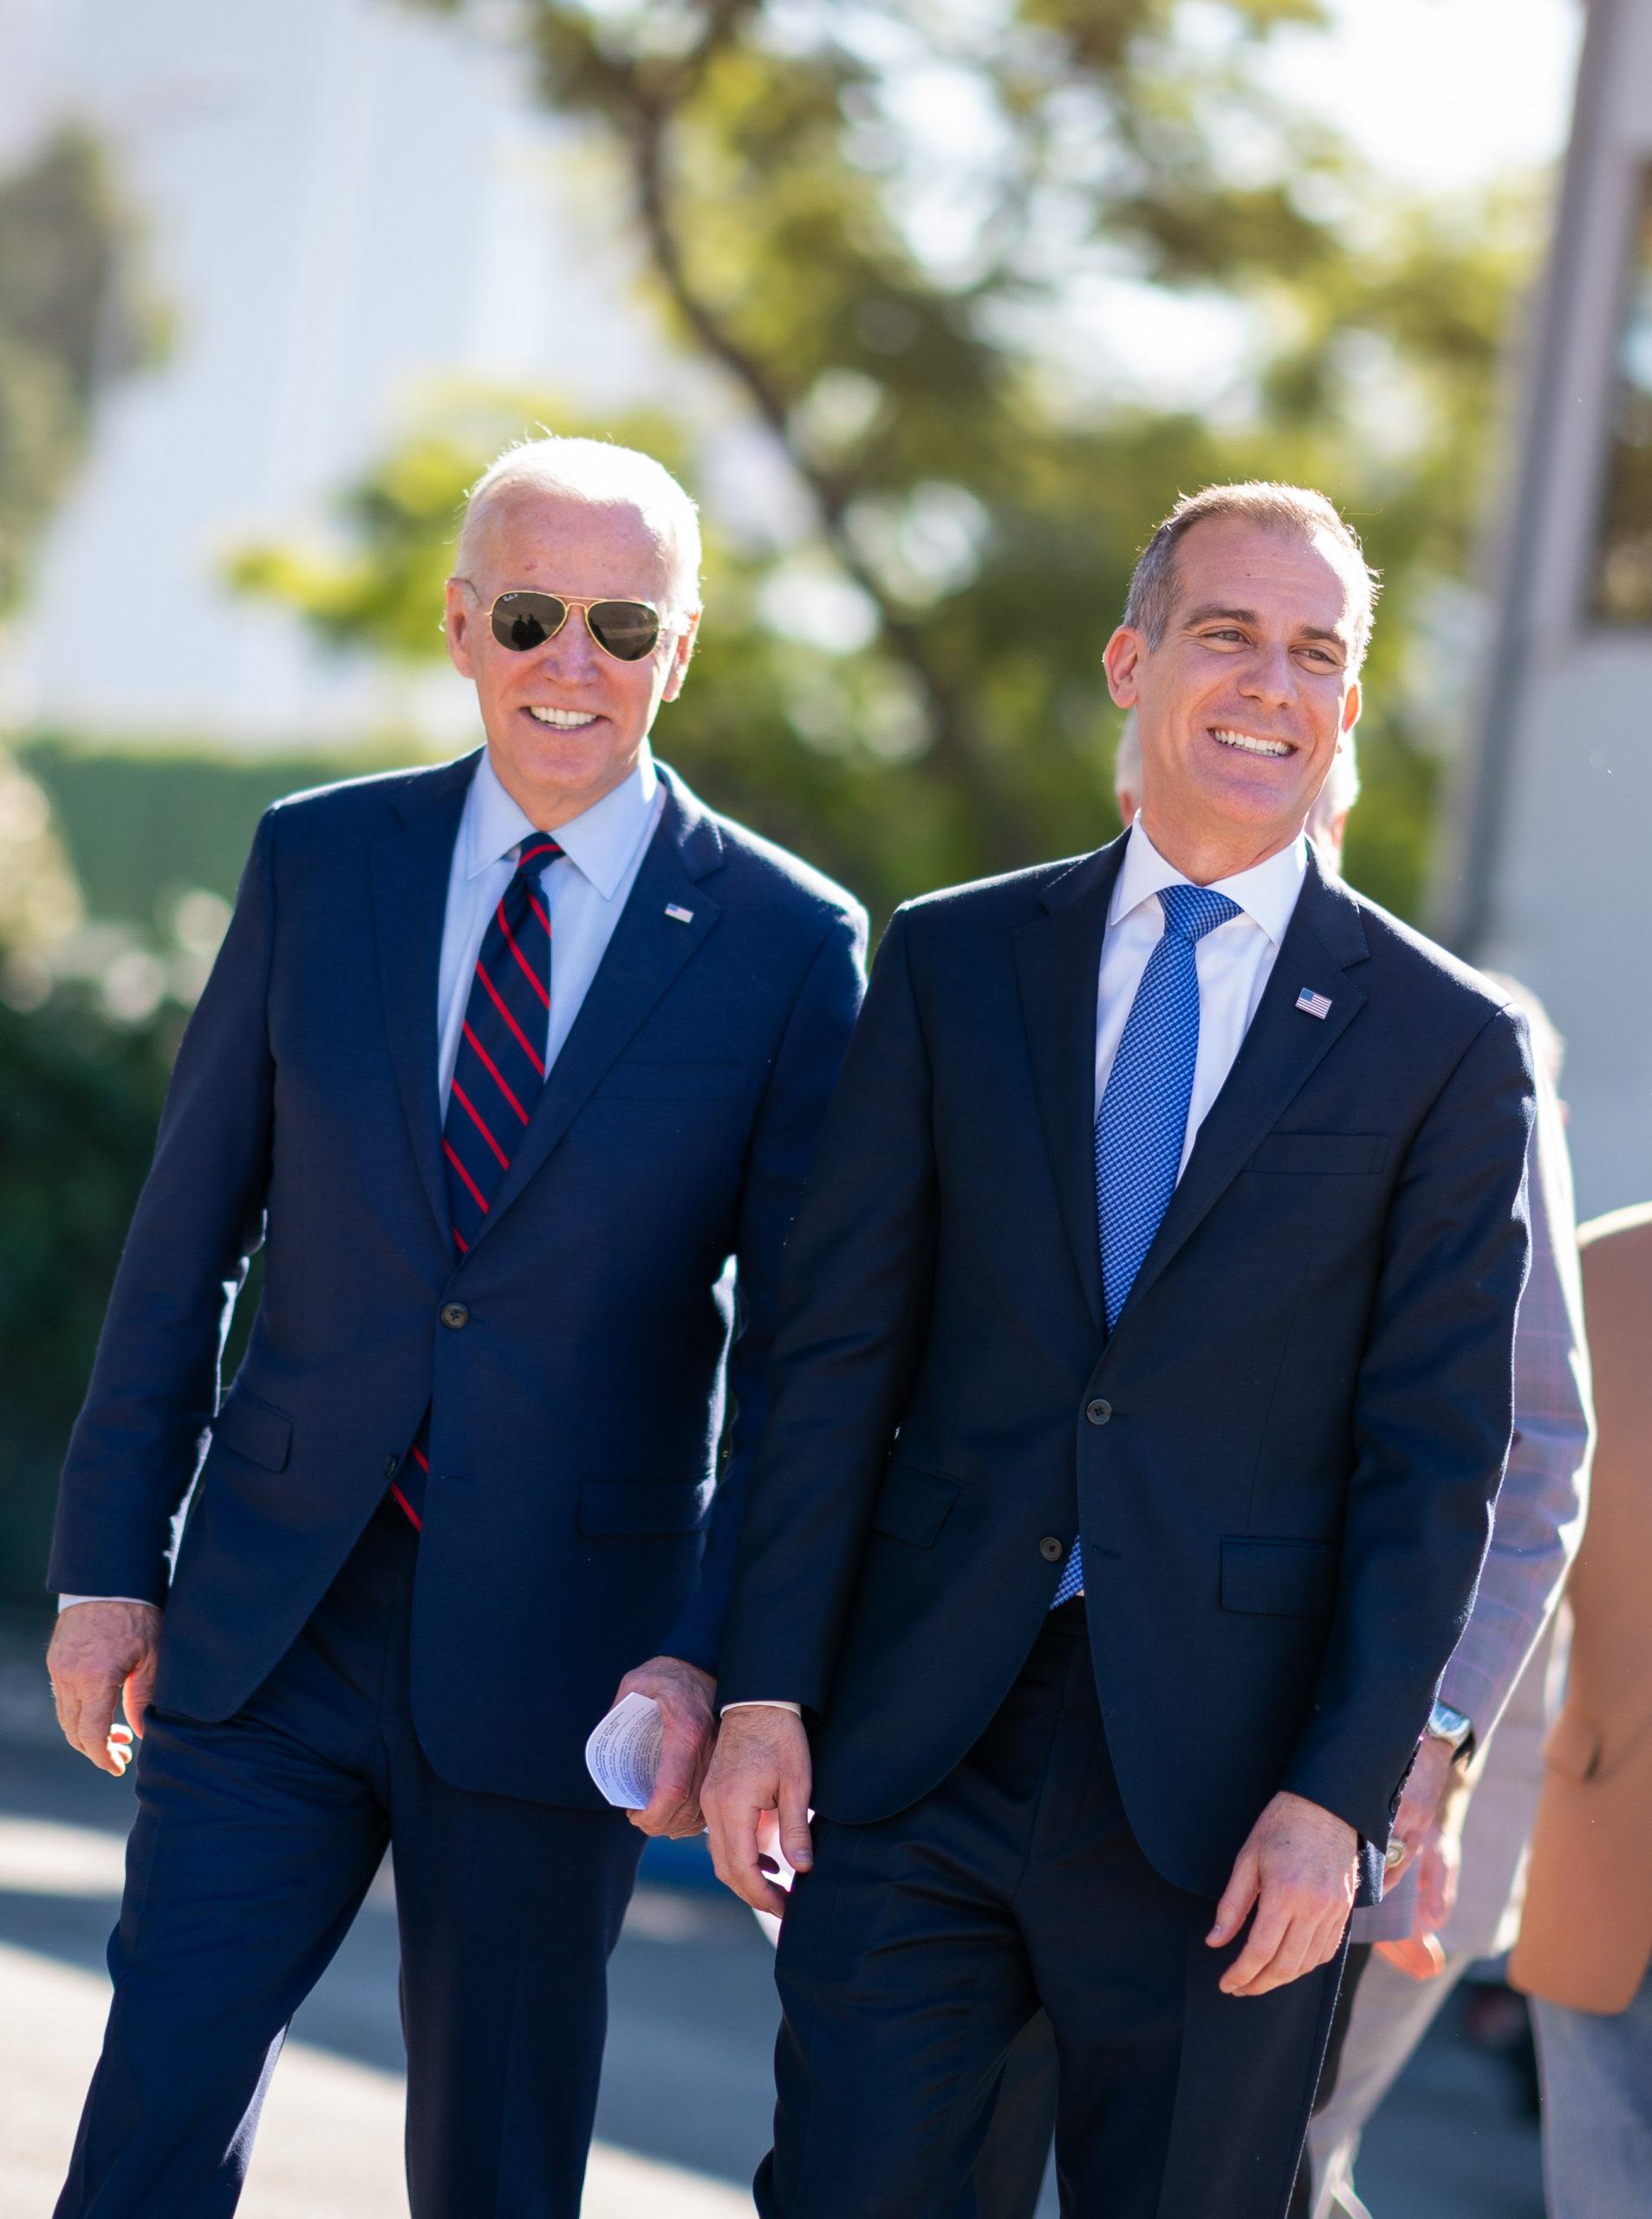 Joe Biden walks with Mayor Eric Garcetti. The two men are wearing suits and American flag lapel pins, and Joe has aviators on.